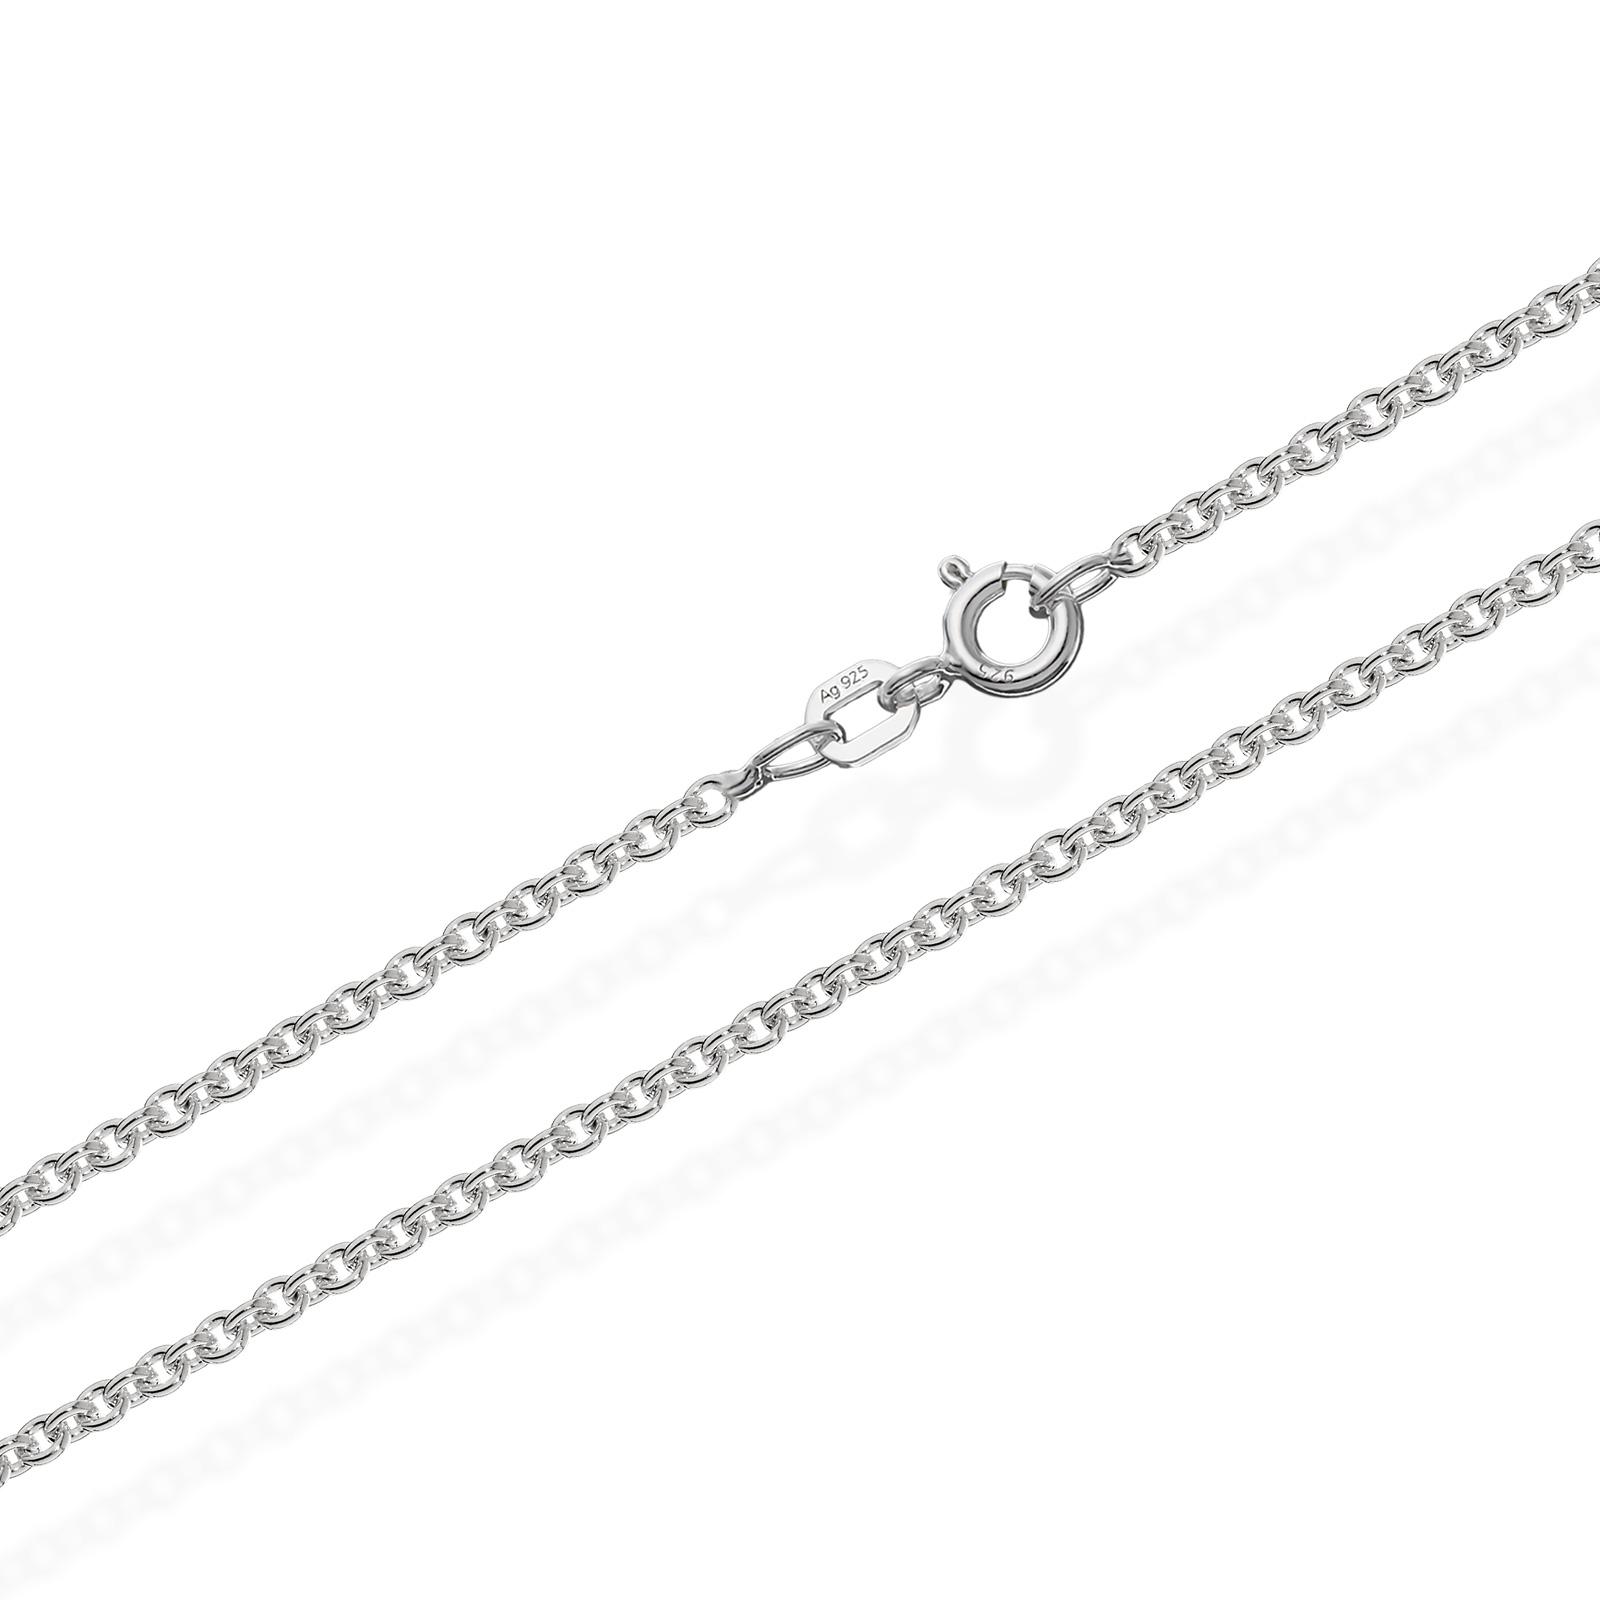 50cm ANKERKETTE 925 Sterling Silber Kette Rund MASSIV Collier 6,7gr 2,40mm  3518 3f4f00dd76